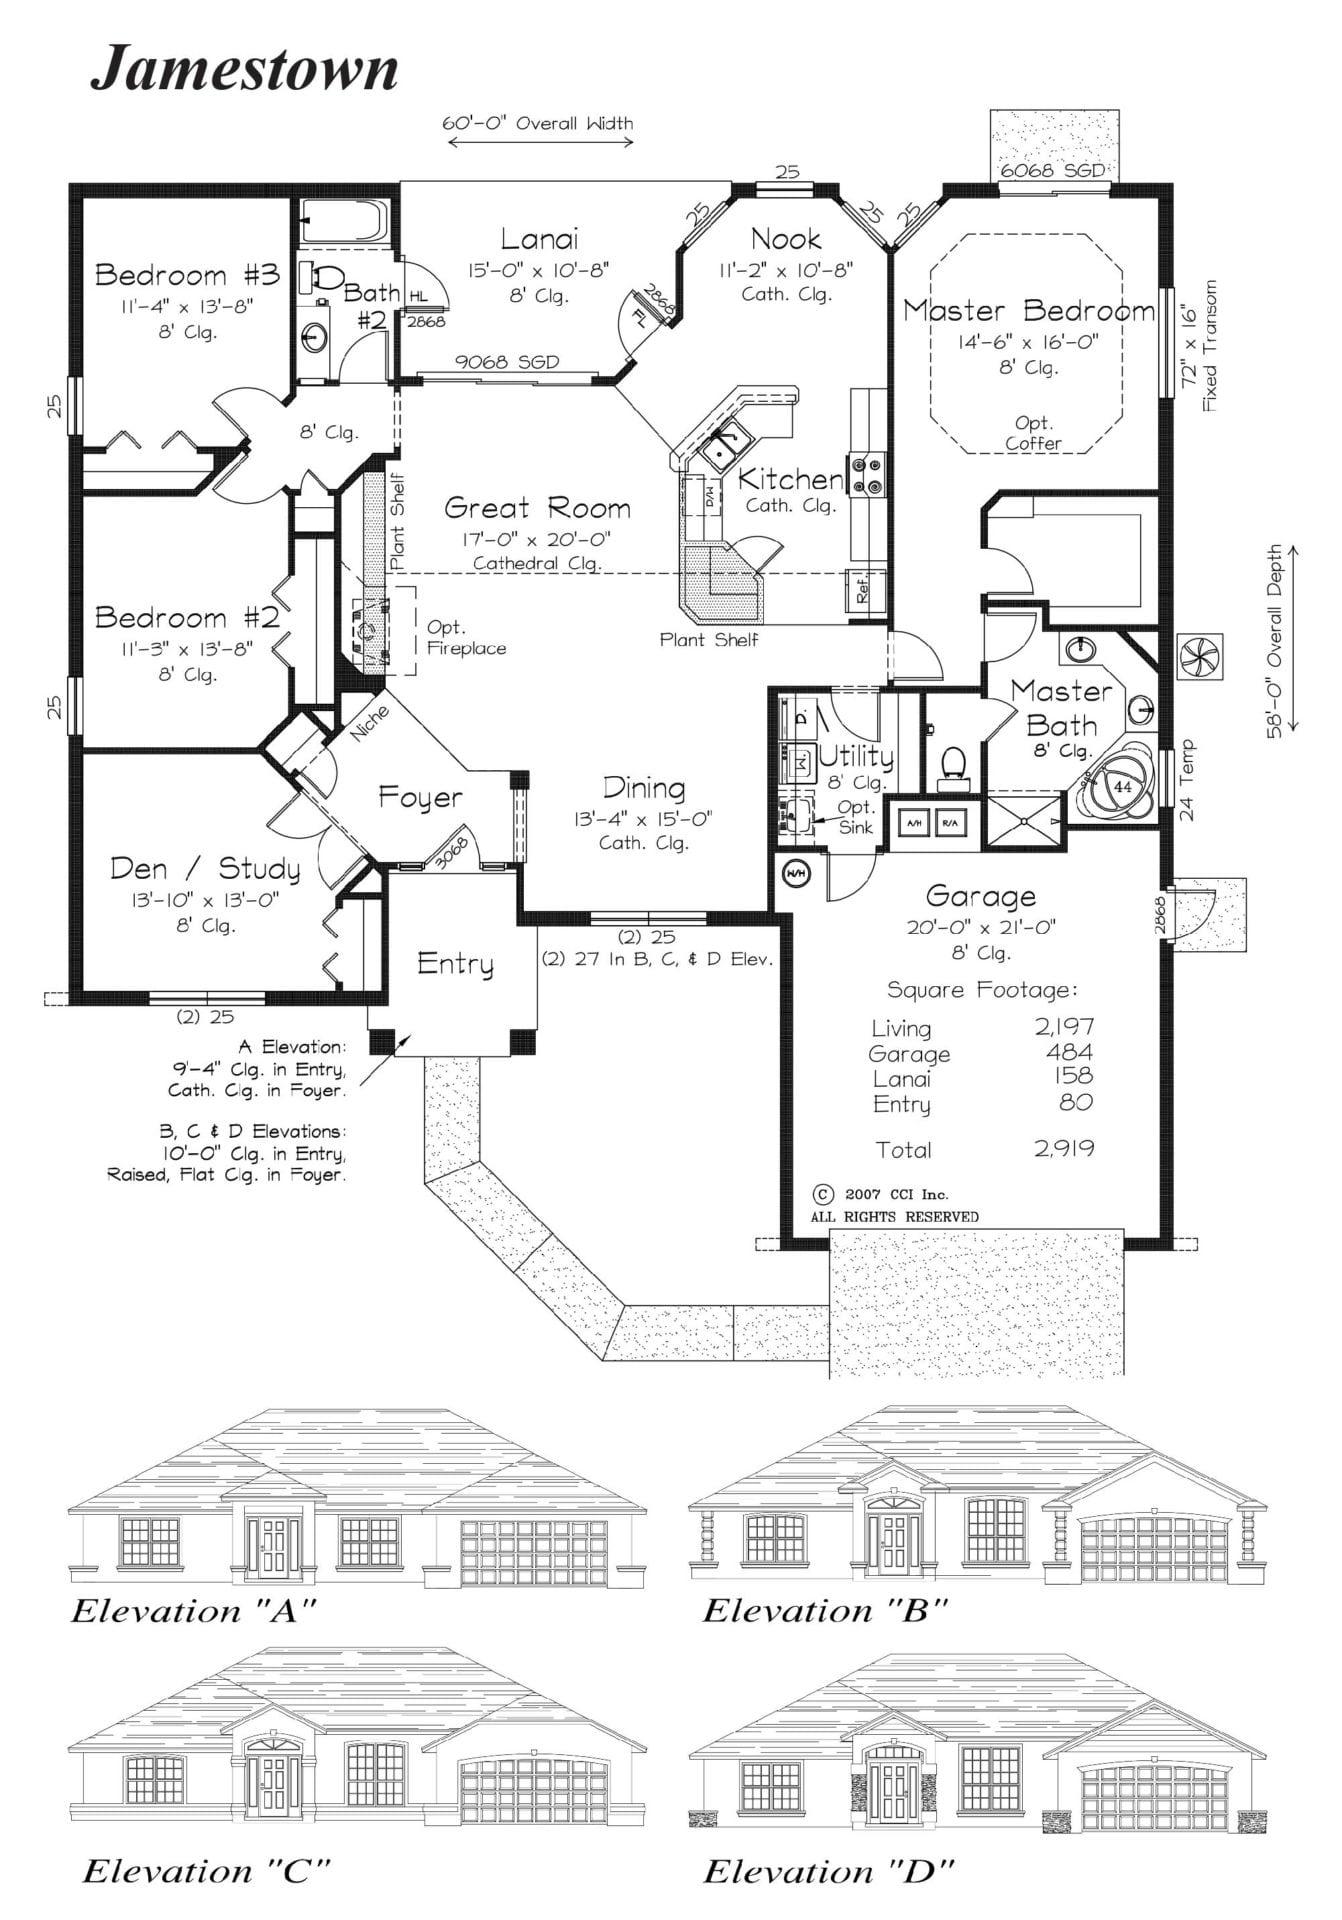 Jamestown - Floor Plan - Curington Homes - Ocala Florida Contractor